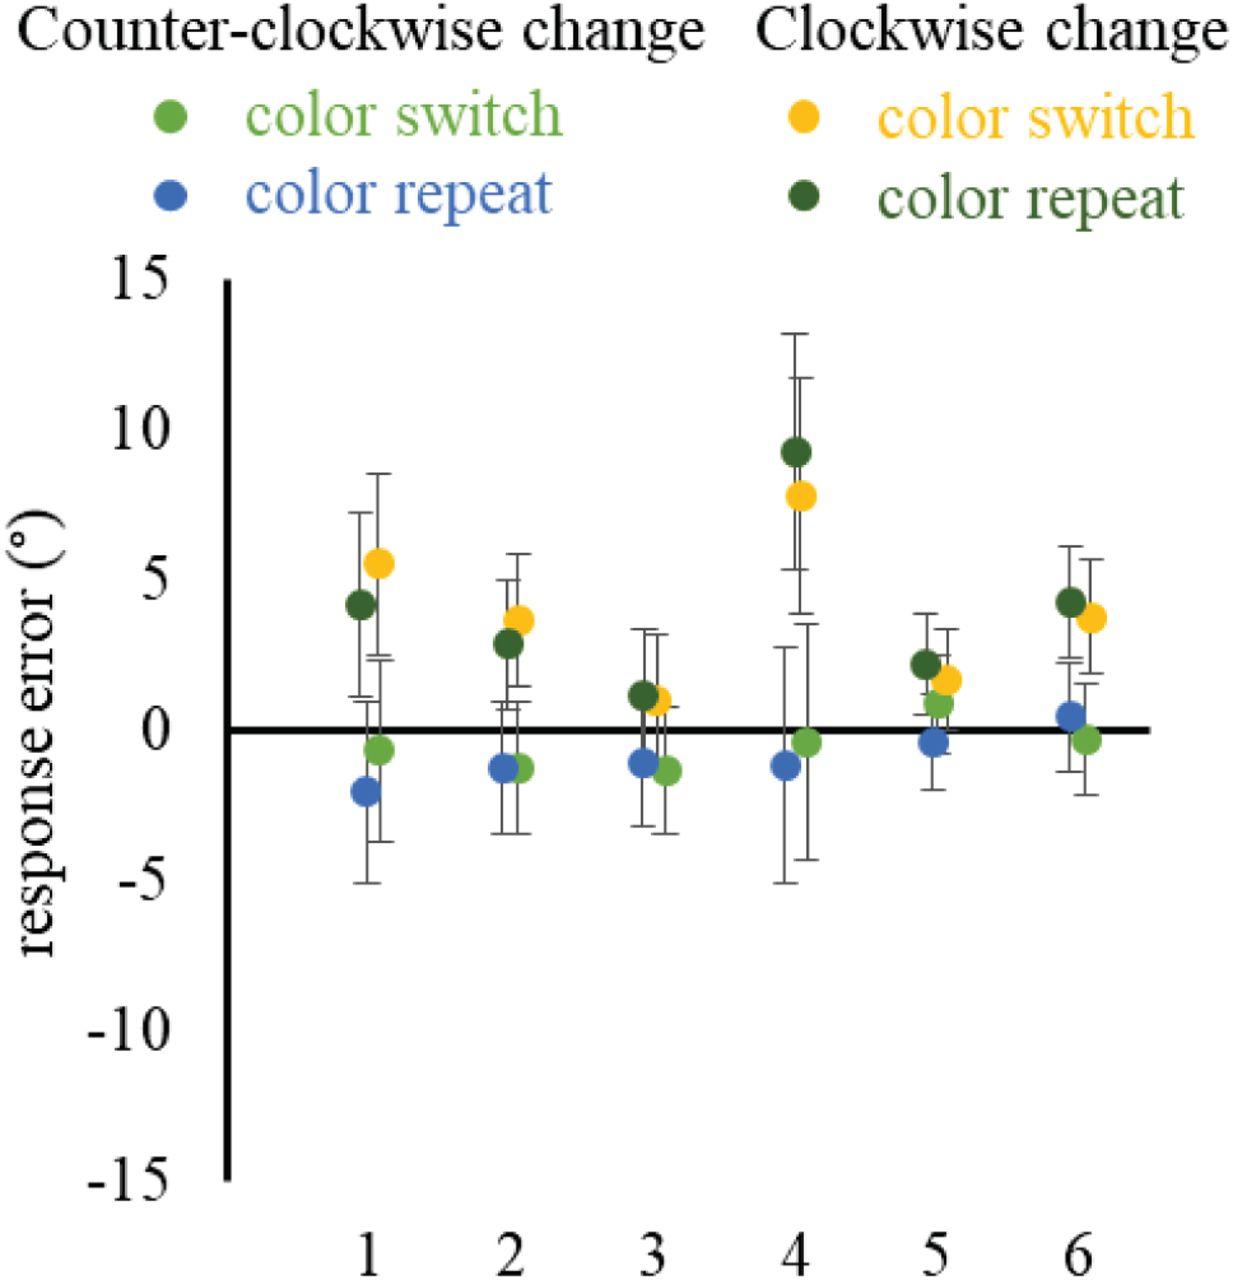 Serial dependence transfers between perceptual objects | bioRxiv